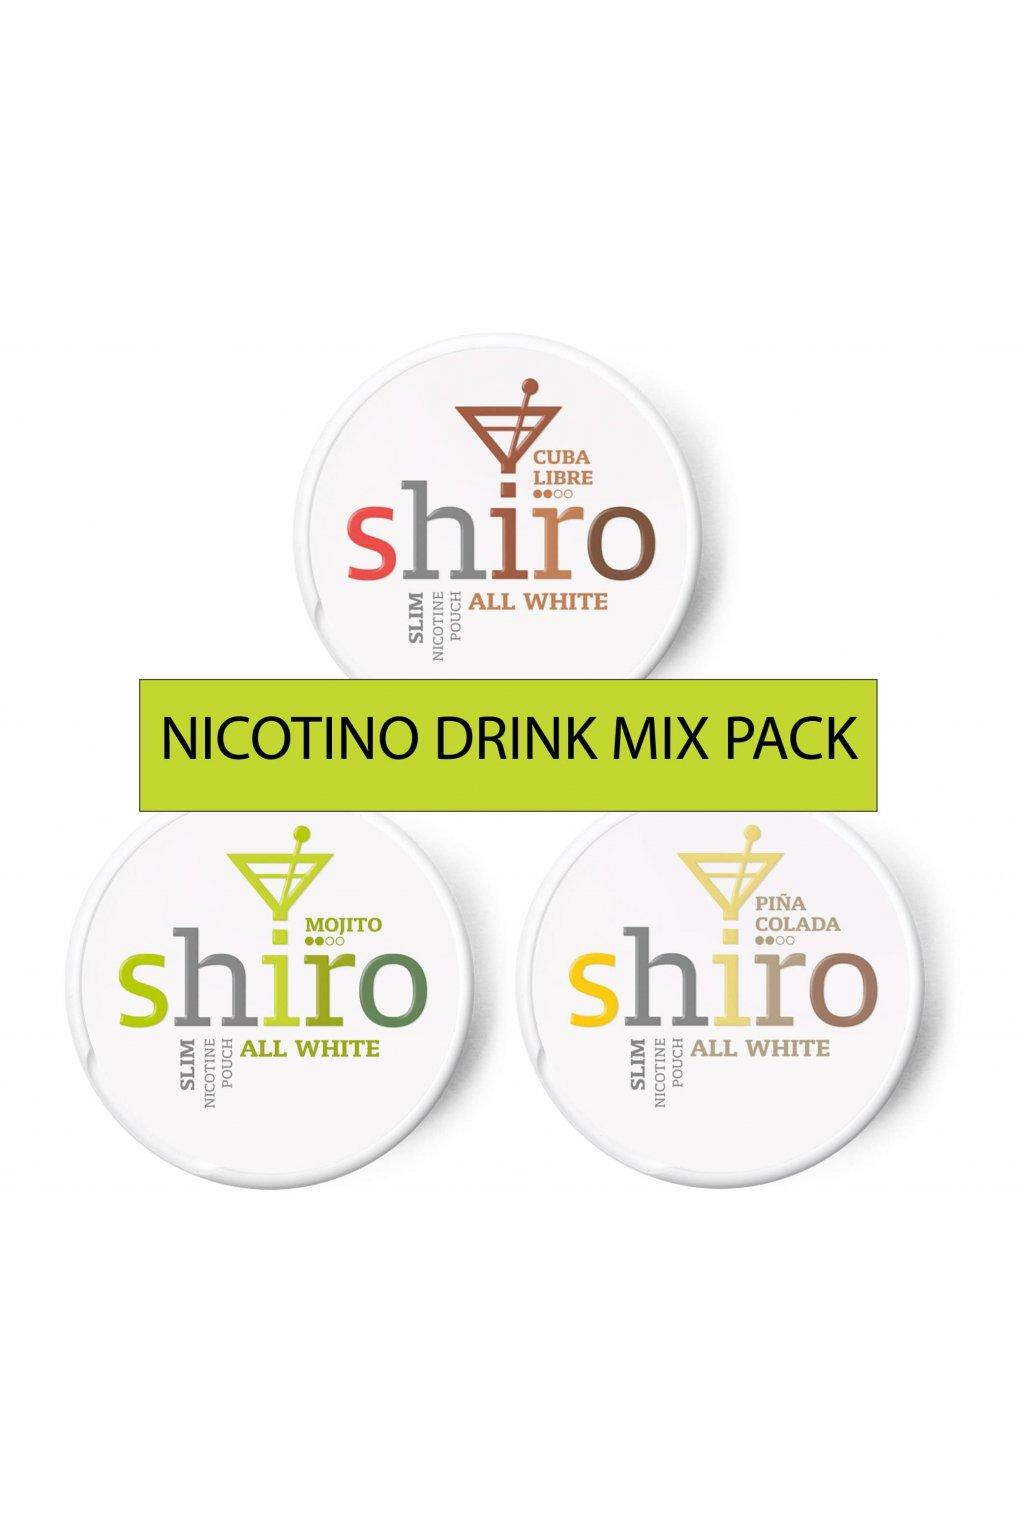 Nicotino drink mix pack min